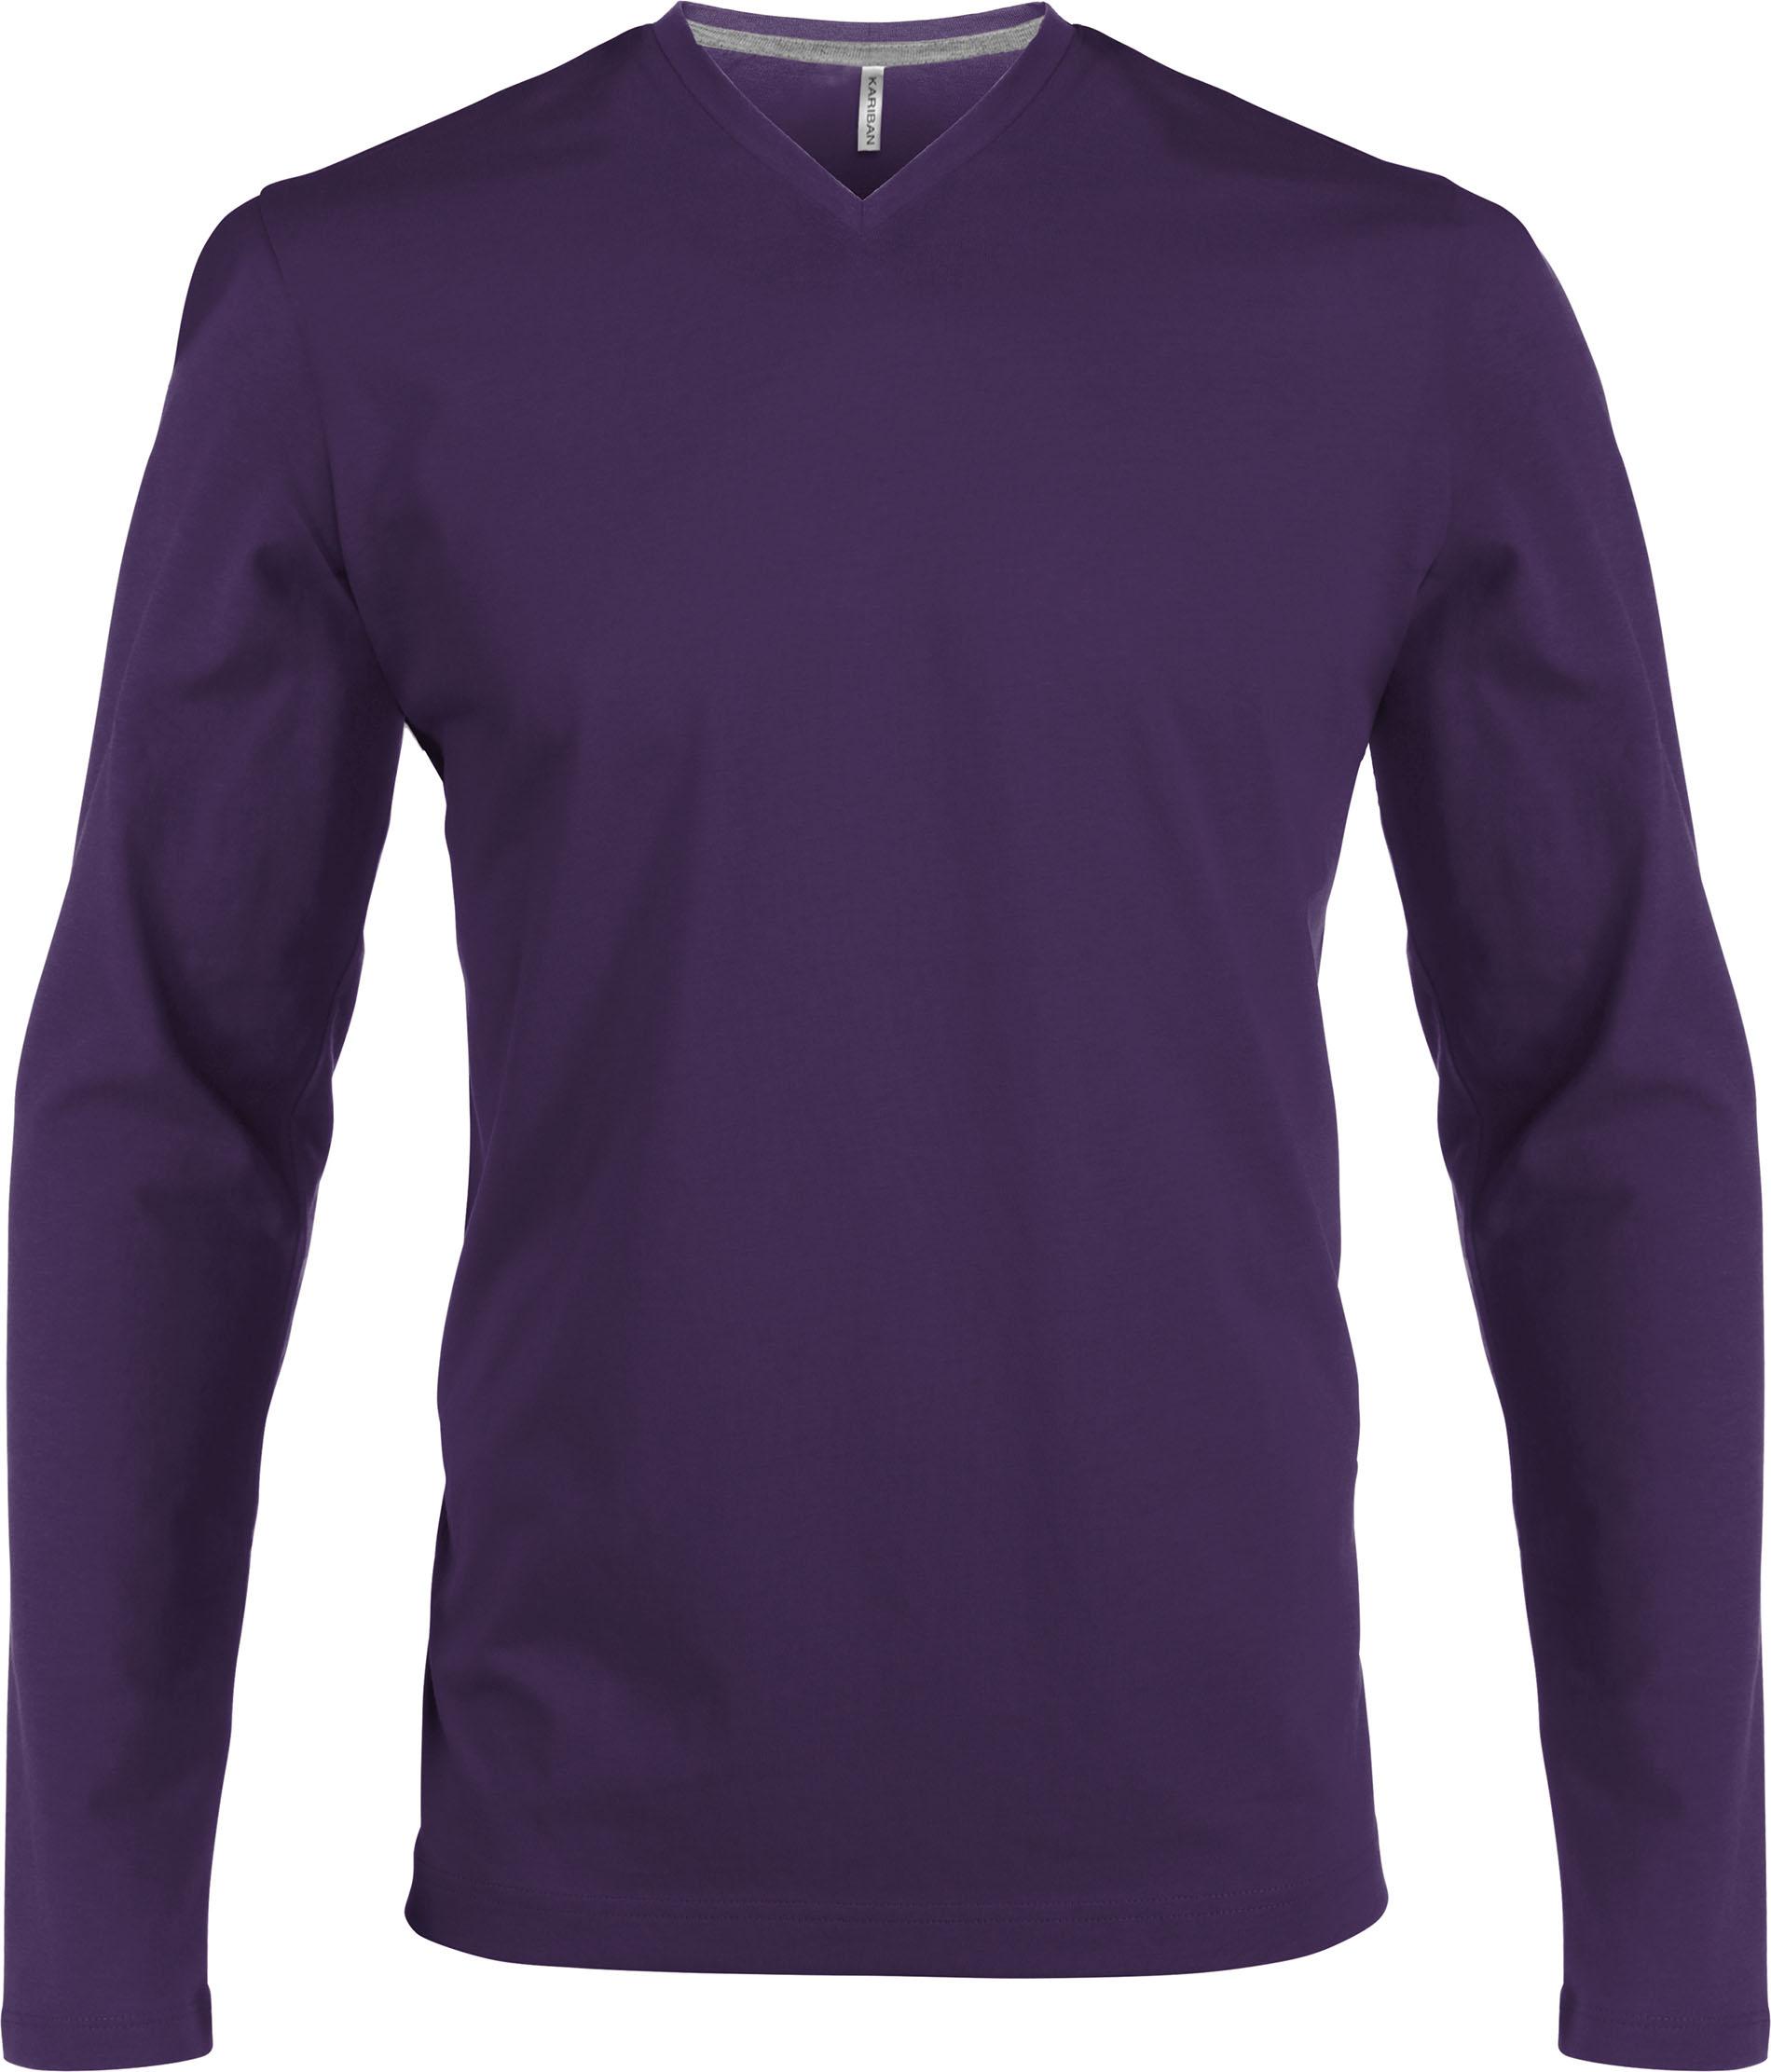 T-paita K358 V-aukko PH Violetti